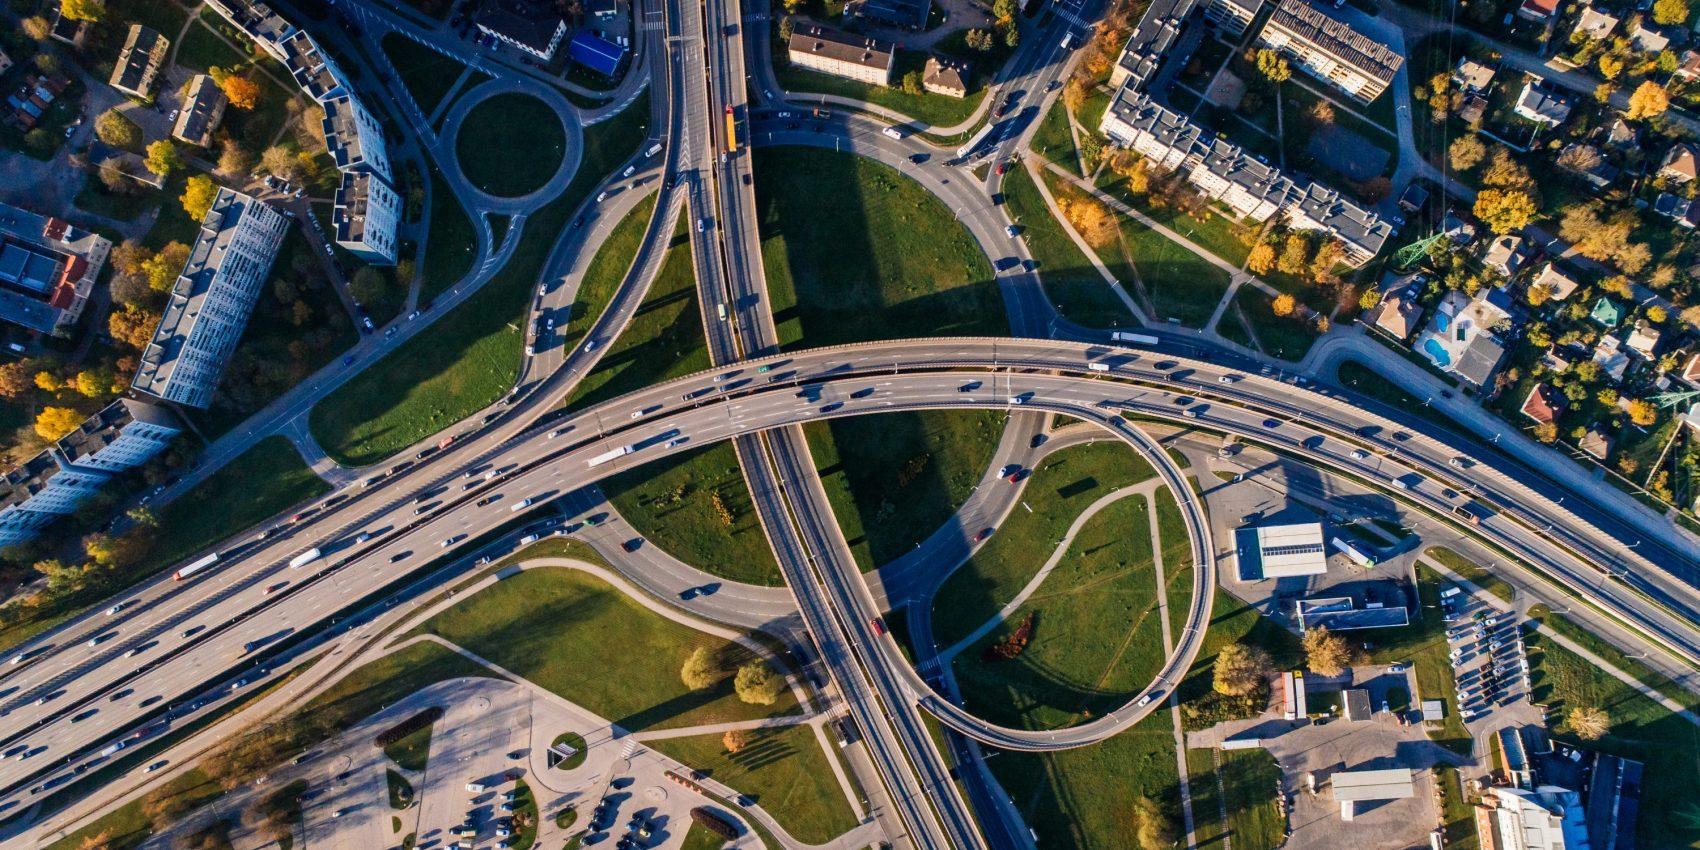 aerial-view-architecture-bridges-681335-e1542893029821